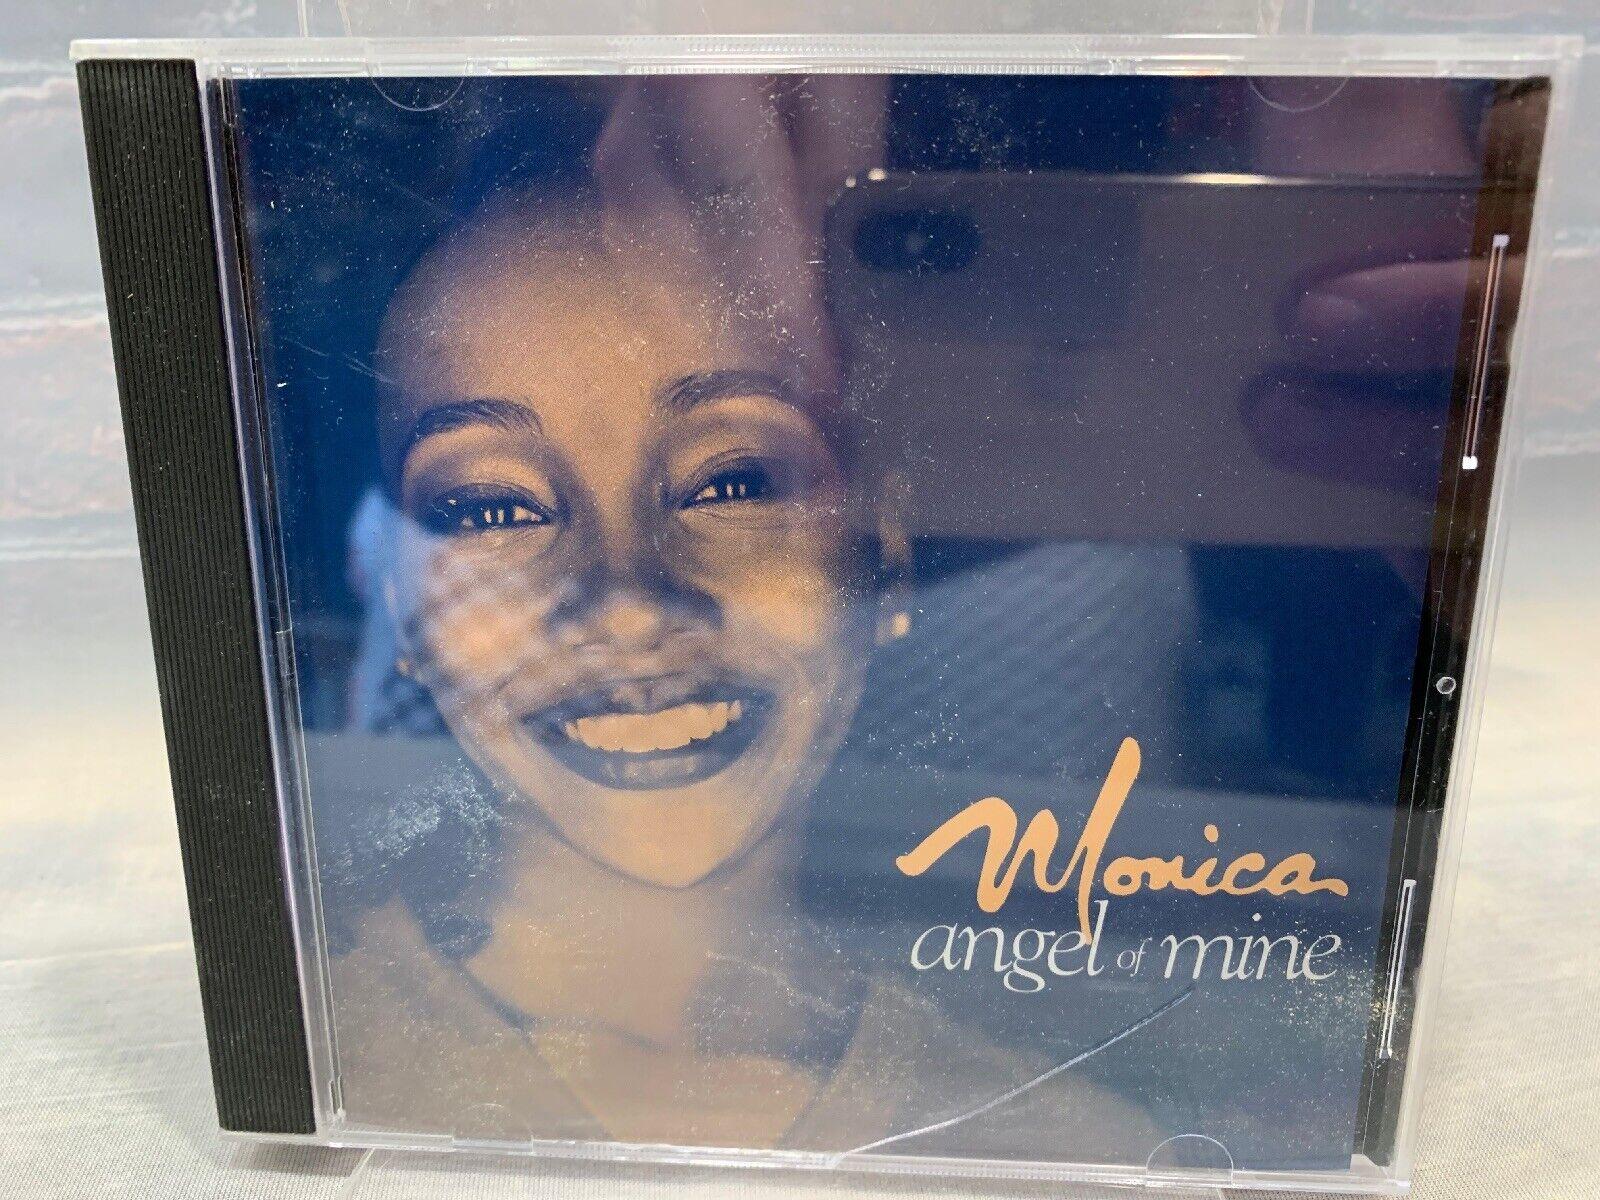 Angel of Mine by Monica (CD, PROMO ...